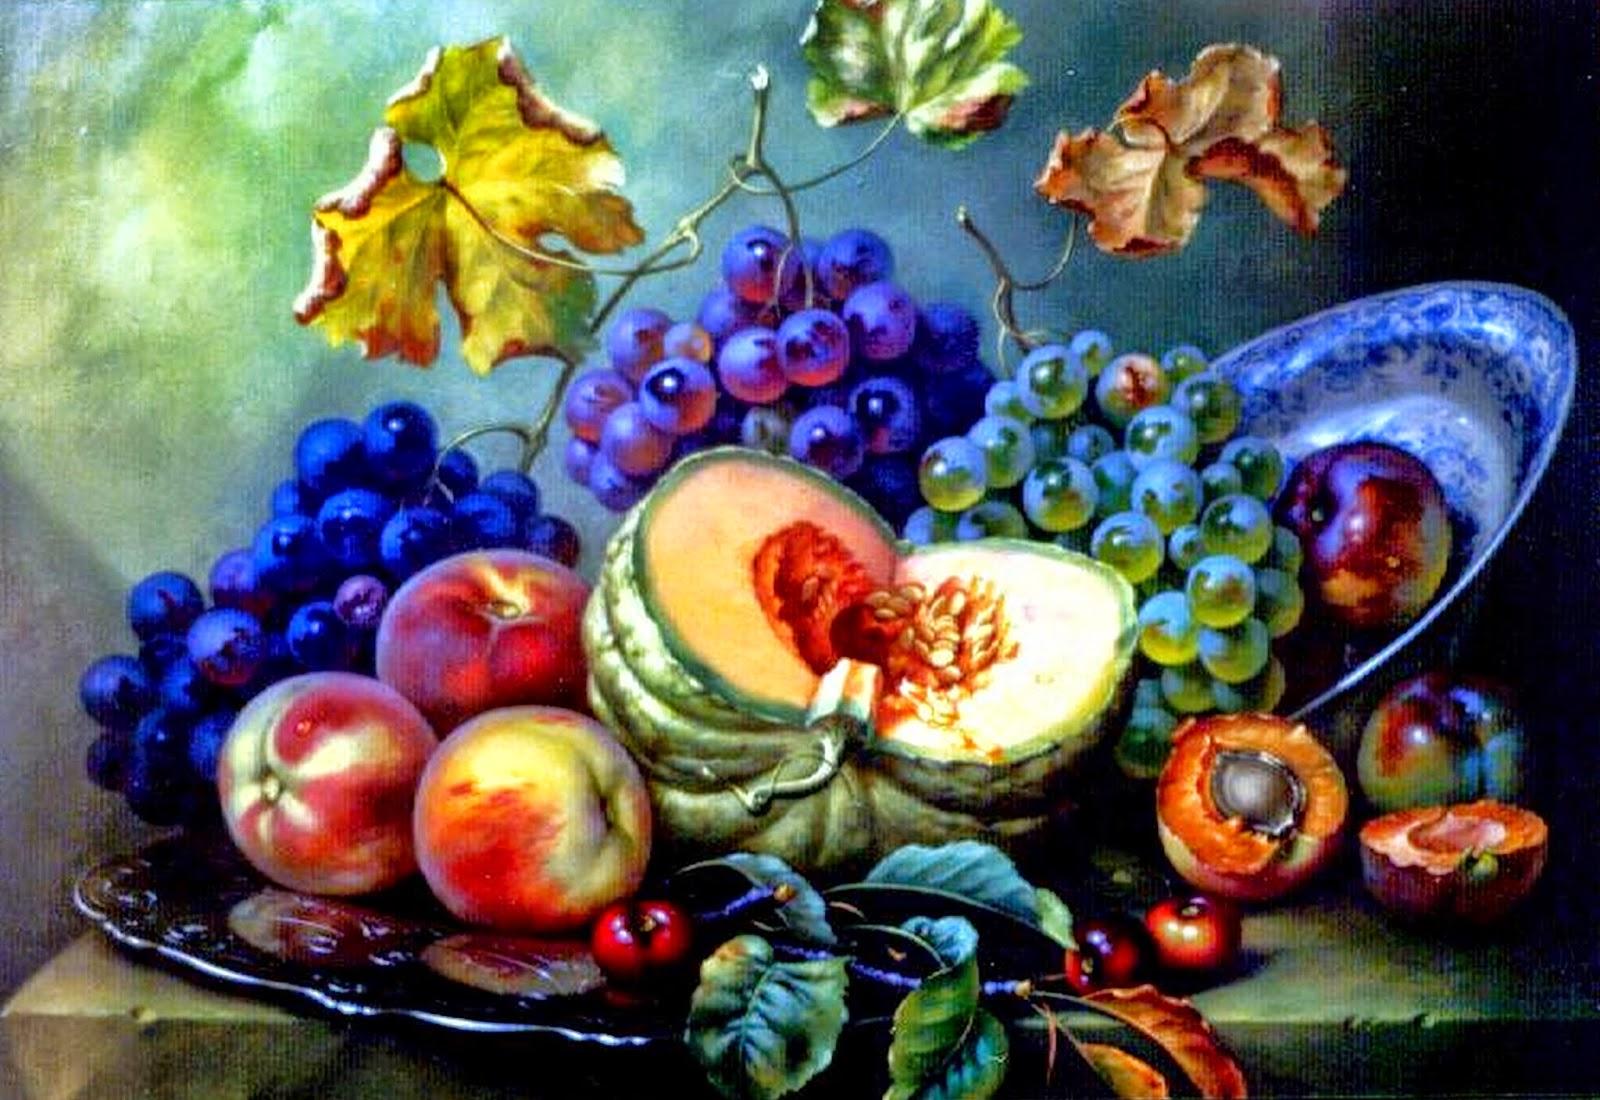 Pintura Moderna Y Fotografia Artistica Pinturas Al Oleo